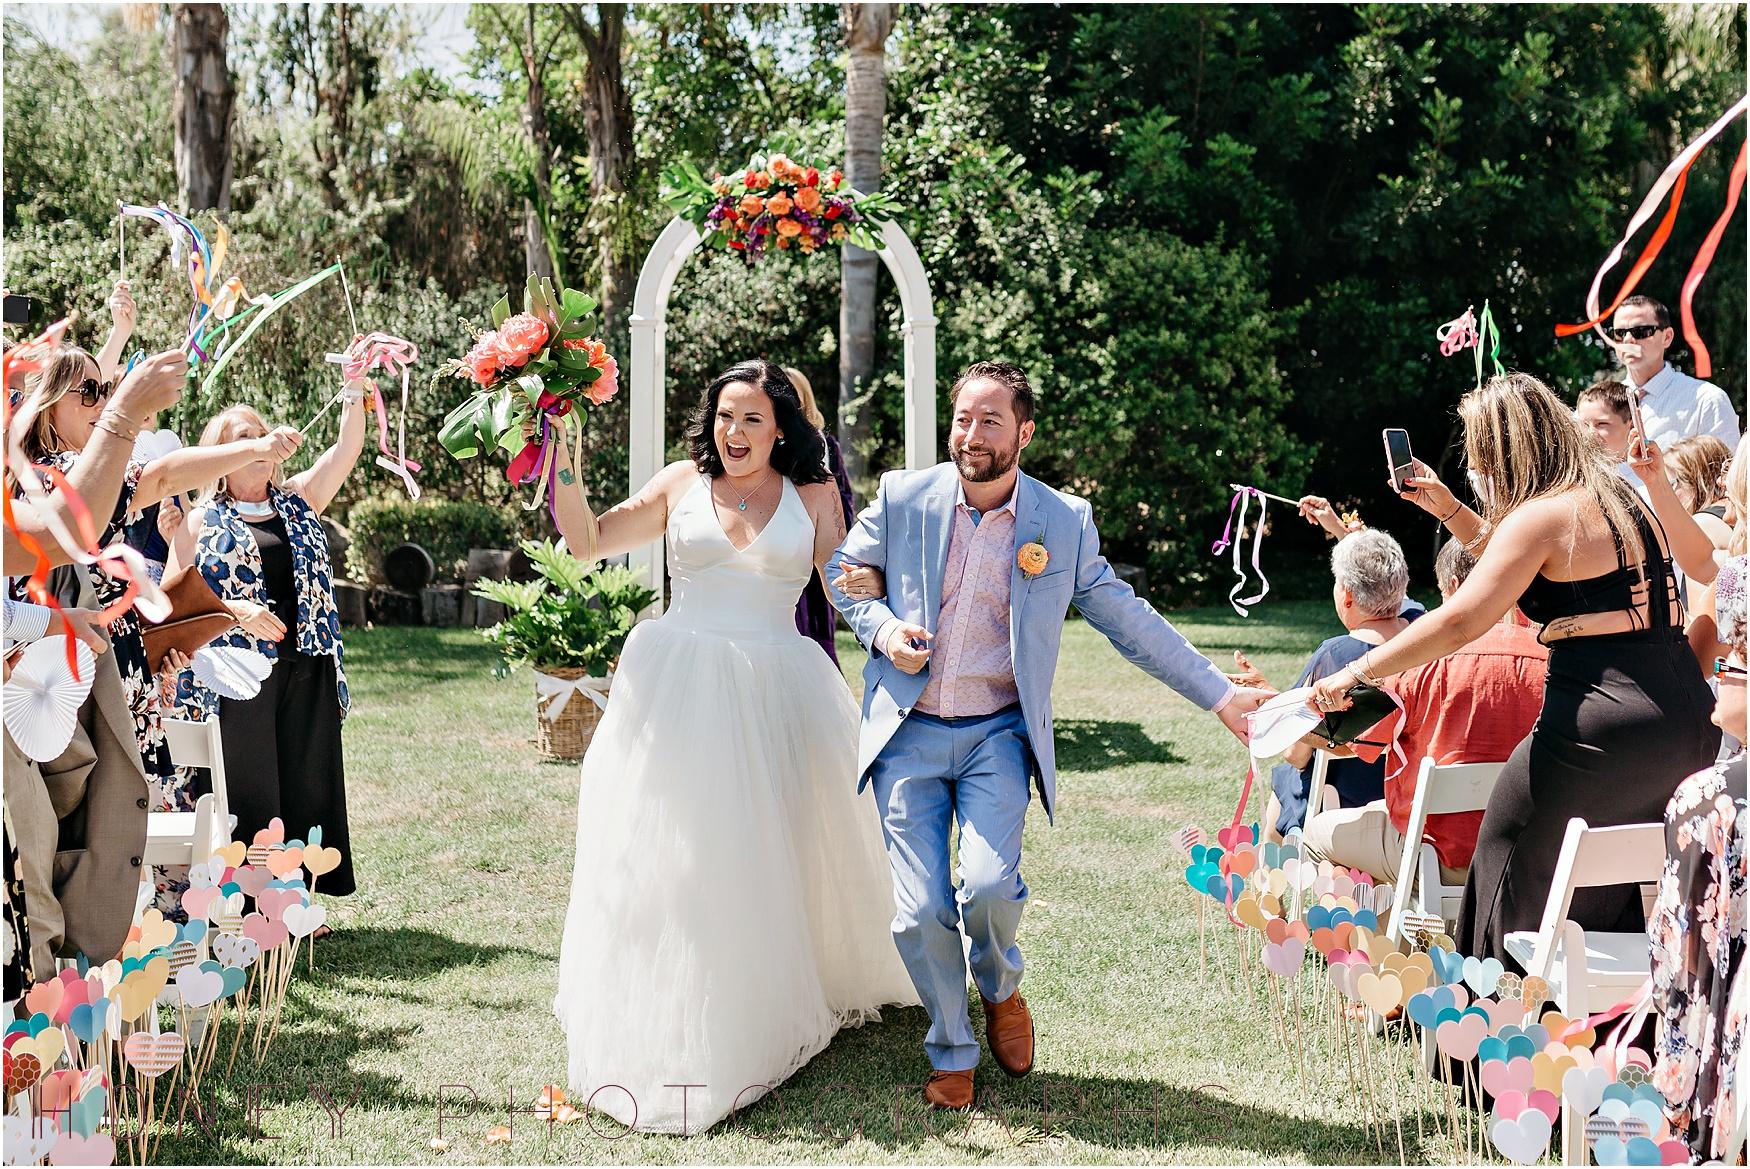 colorful_ecclectic_vibrant_vista_rainbow_quirky_wedding024.jpg